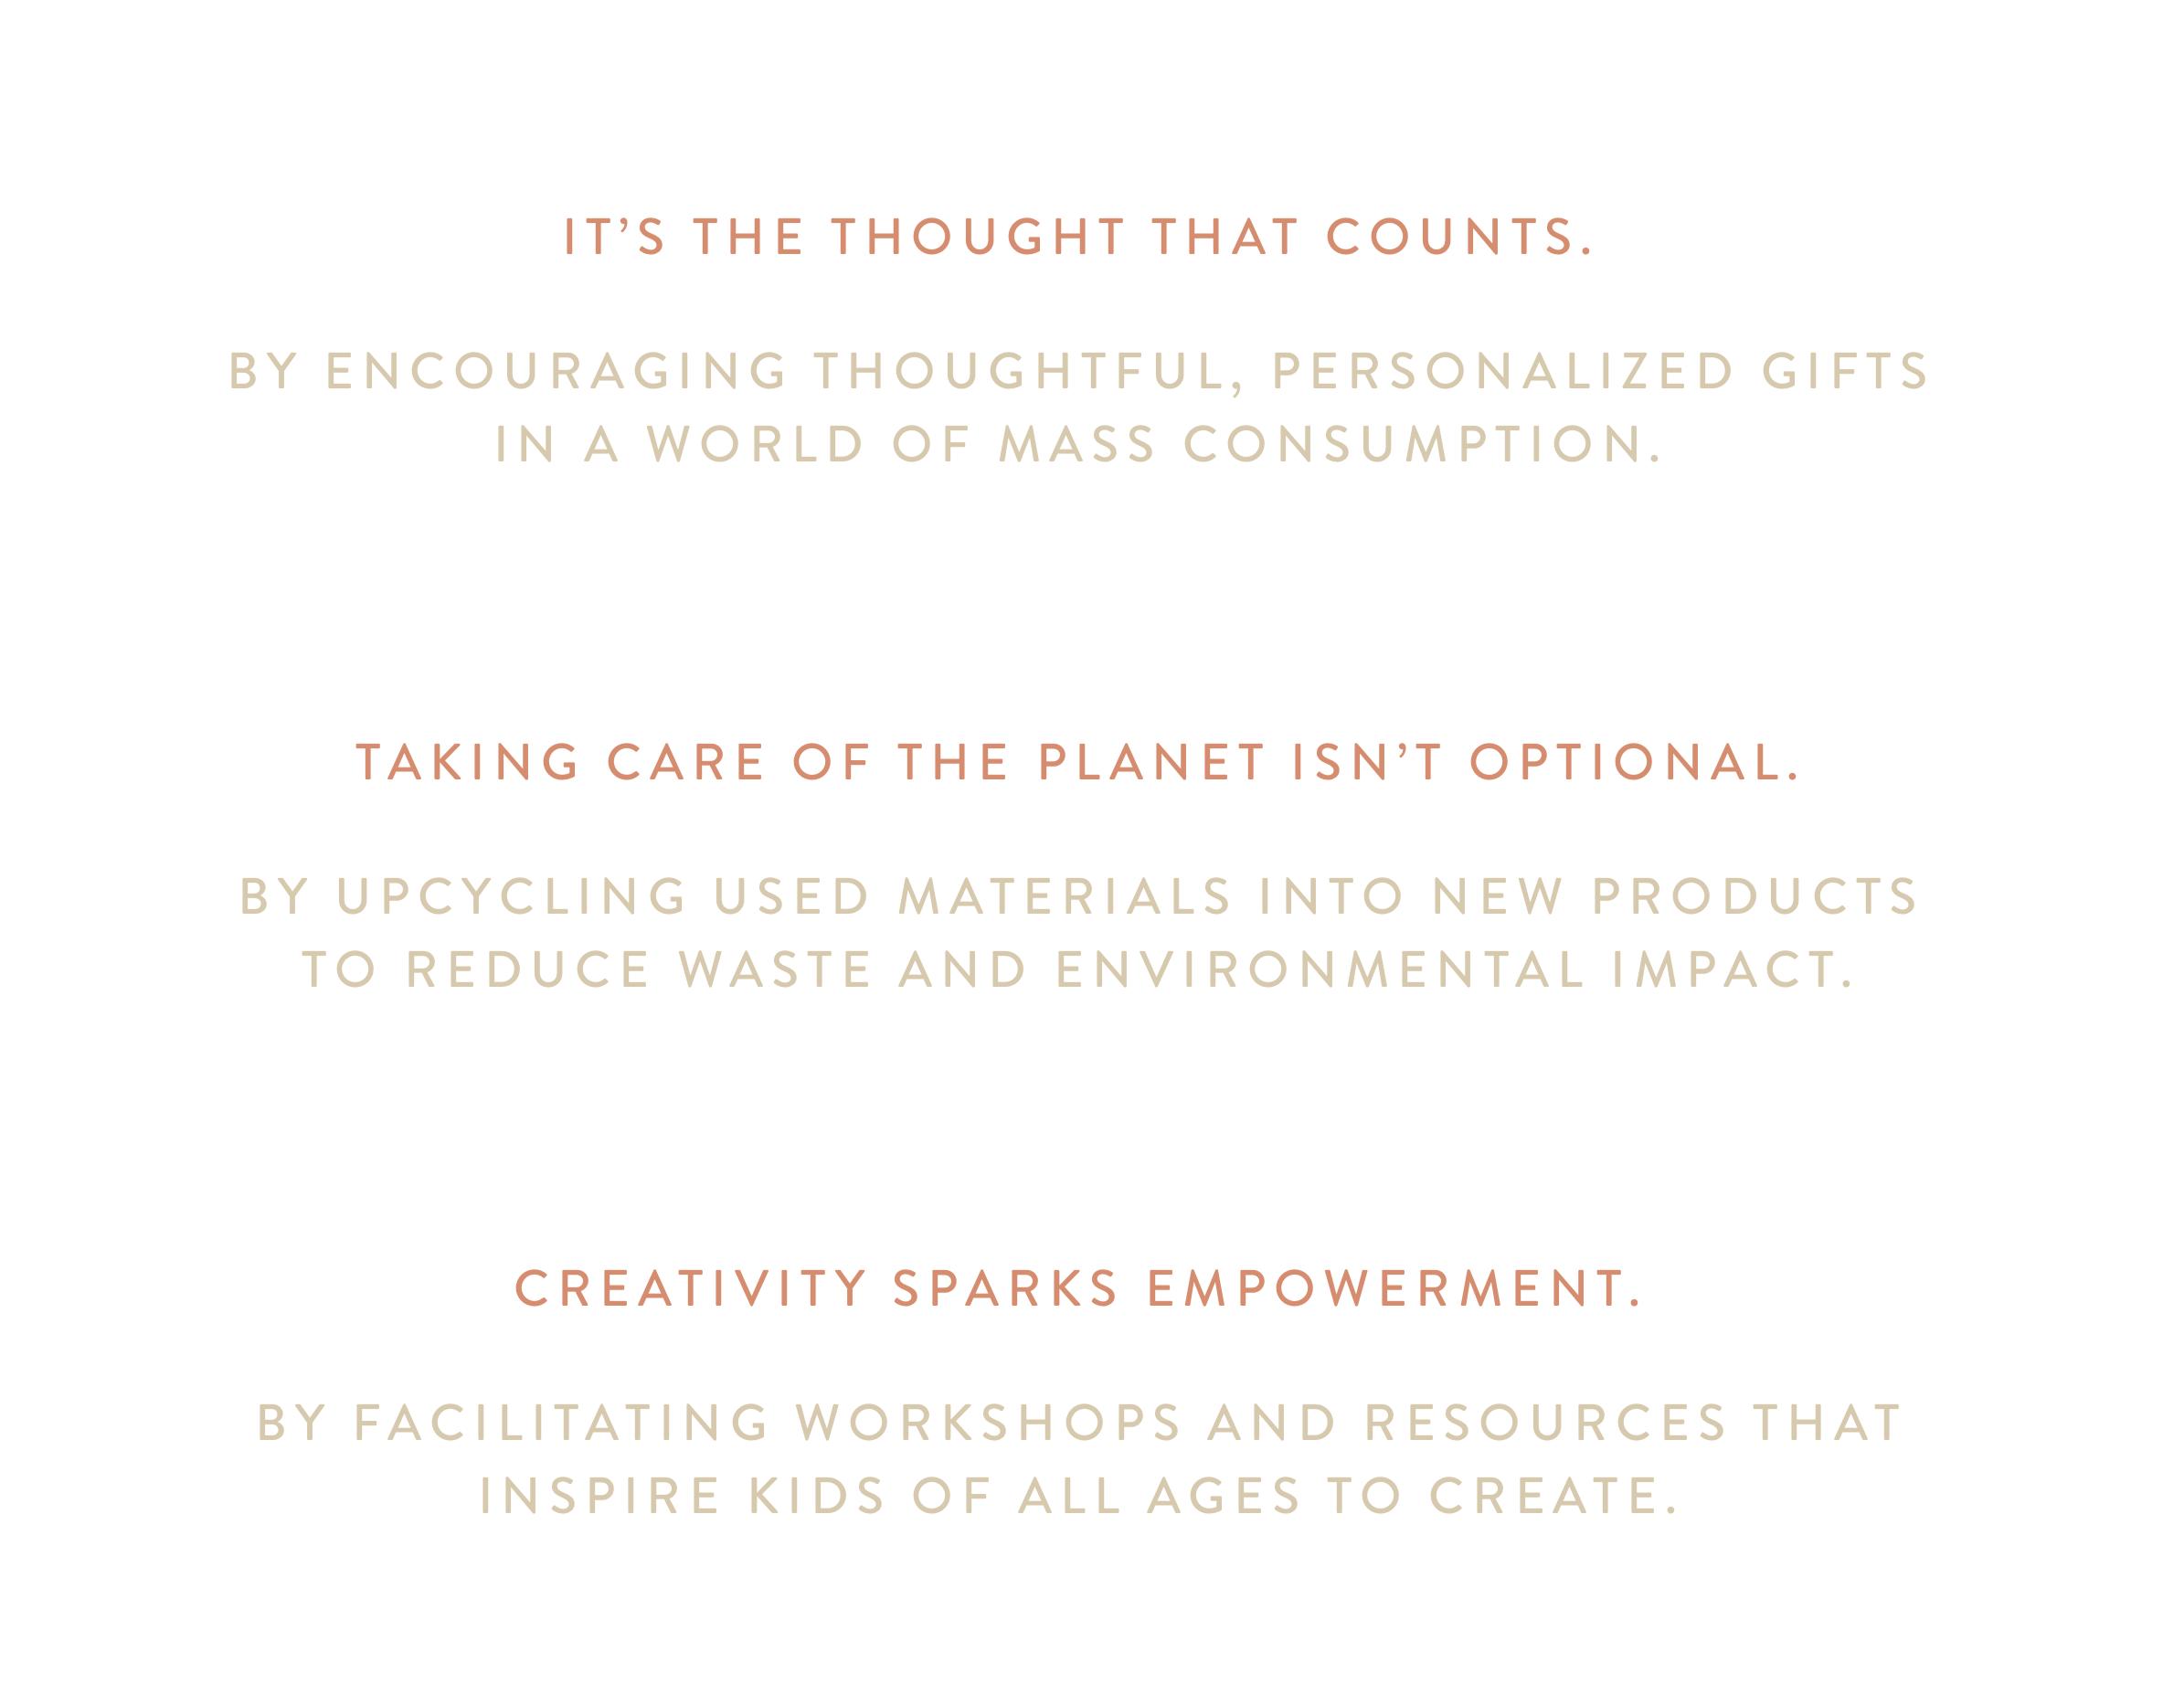 flourish-collaborative-brand-process-core-beliefs-lettees.png